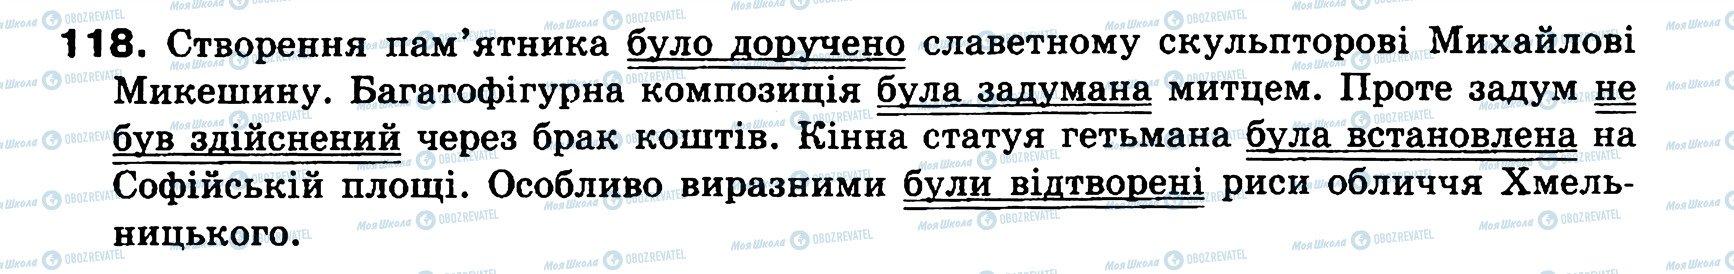 ГДЗ Укр мова 8 класс страница 118